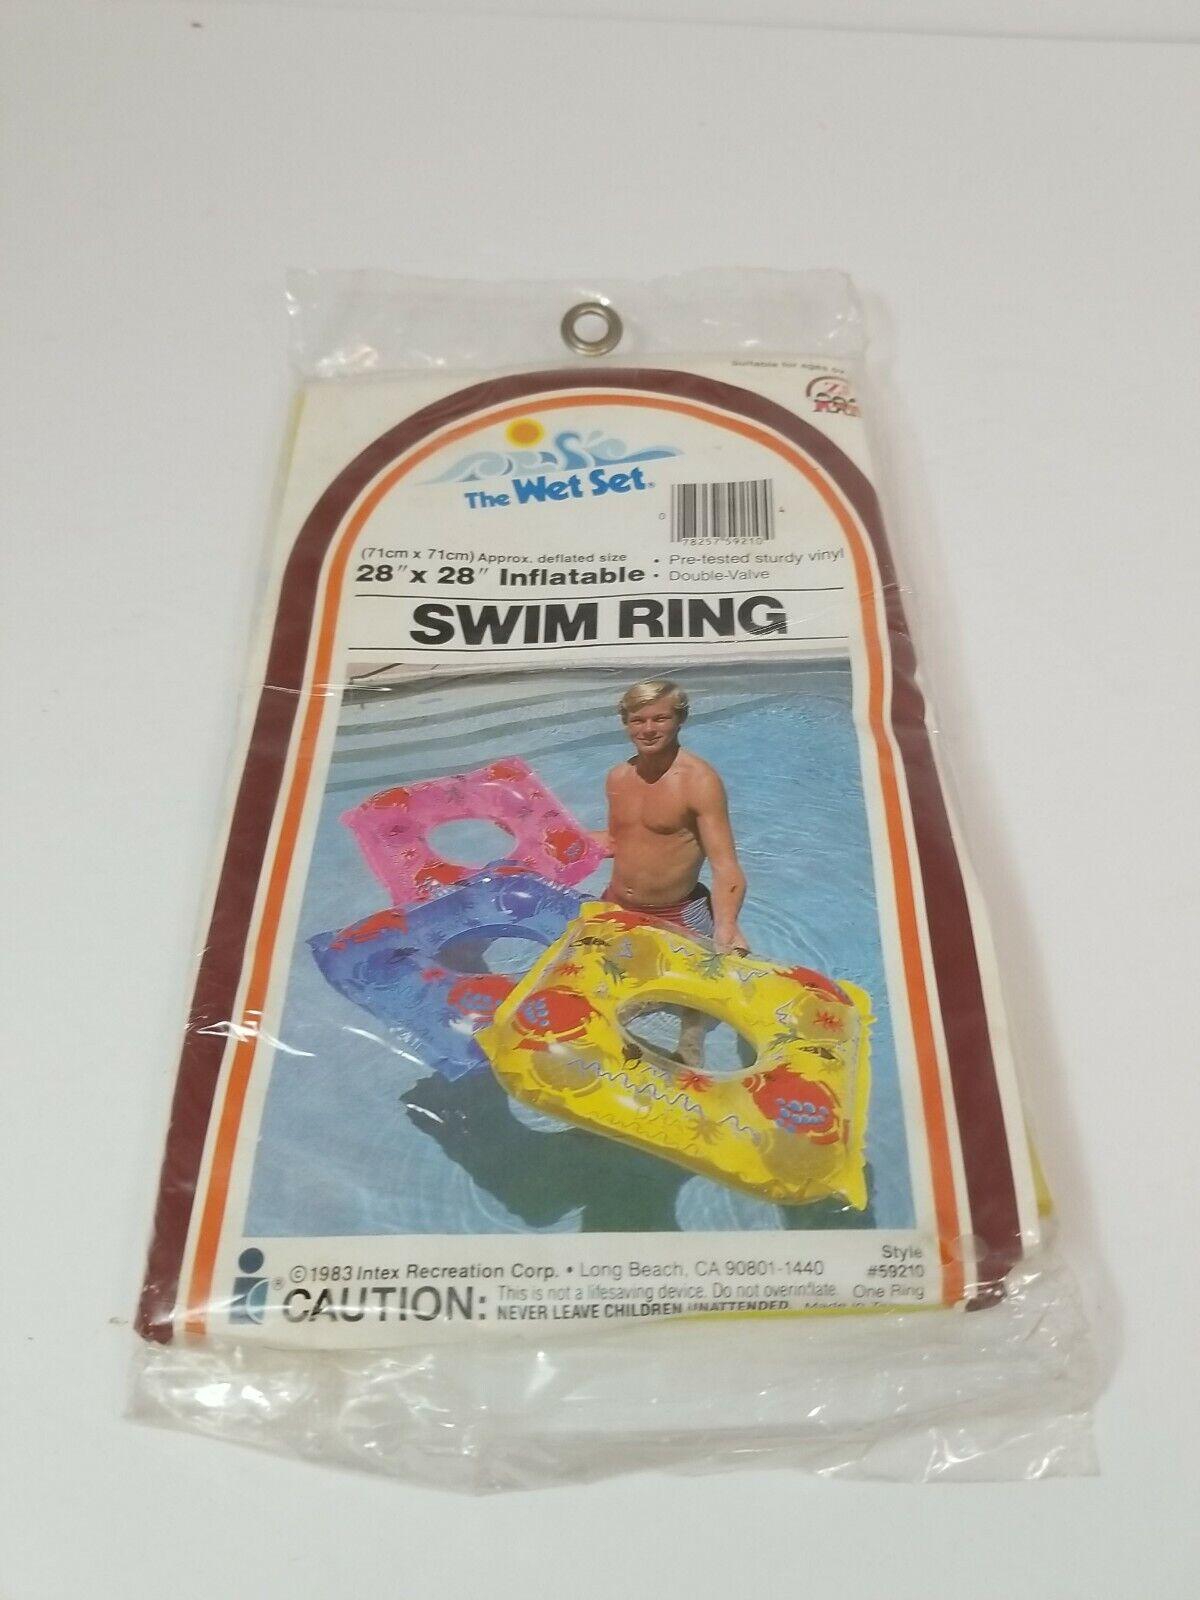 Vtg Sealed 1983 Intex The Wet Set Vinyl Inflatable Swim Ring Double Valve Yellow